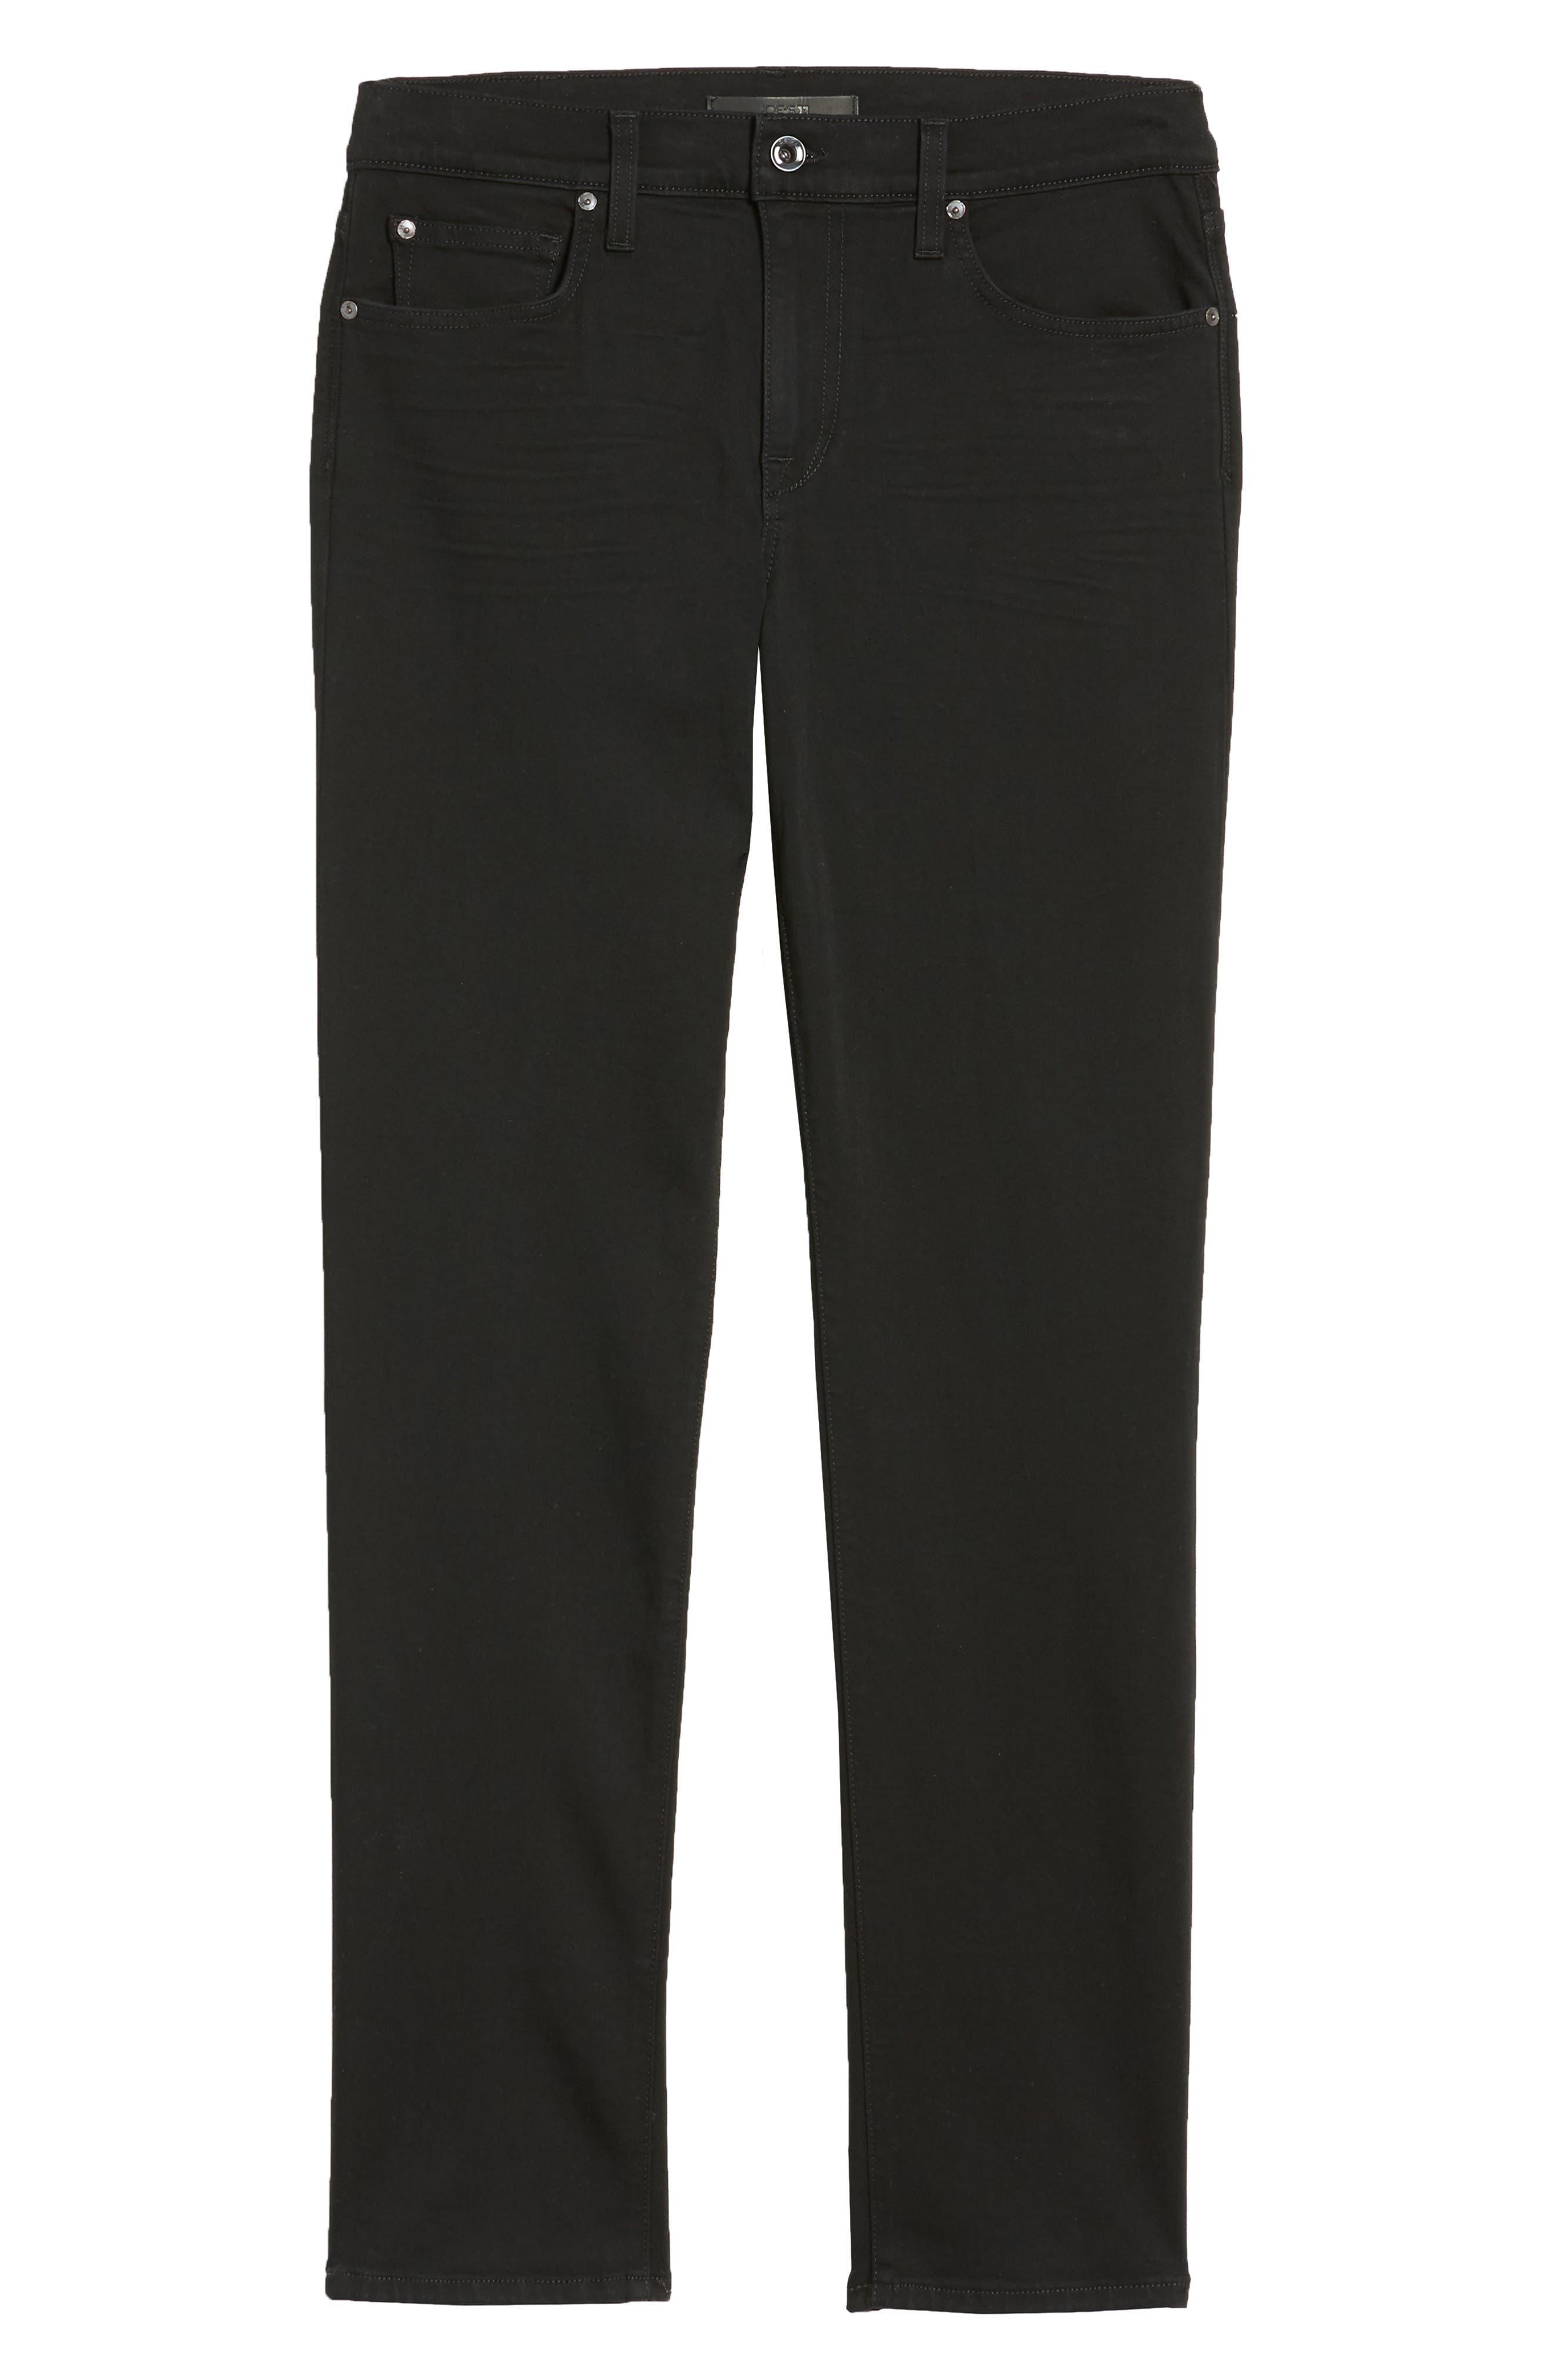 Brixton Slim Straight Fit Jeans,                             Alternate thumbnail 6, color,                             Abraham